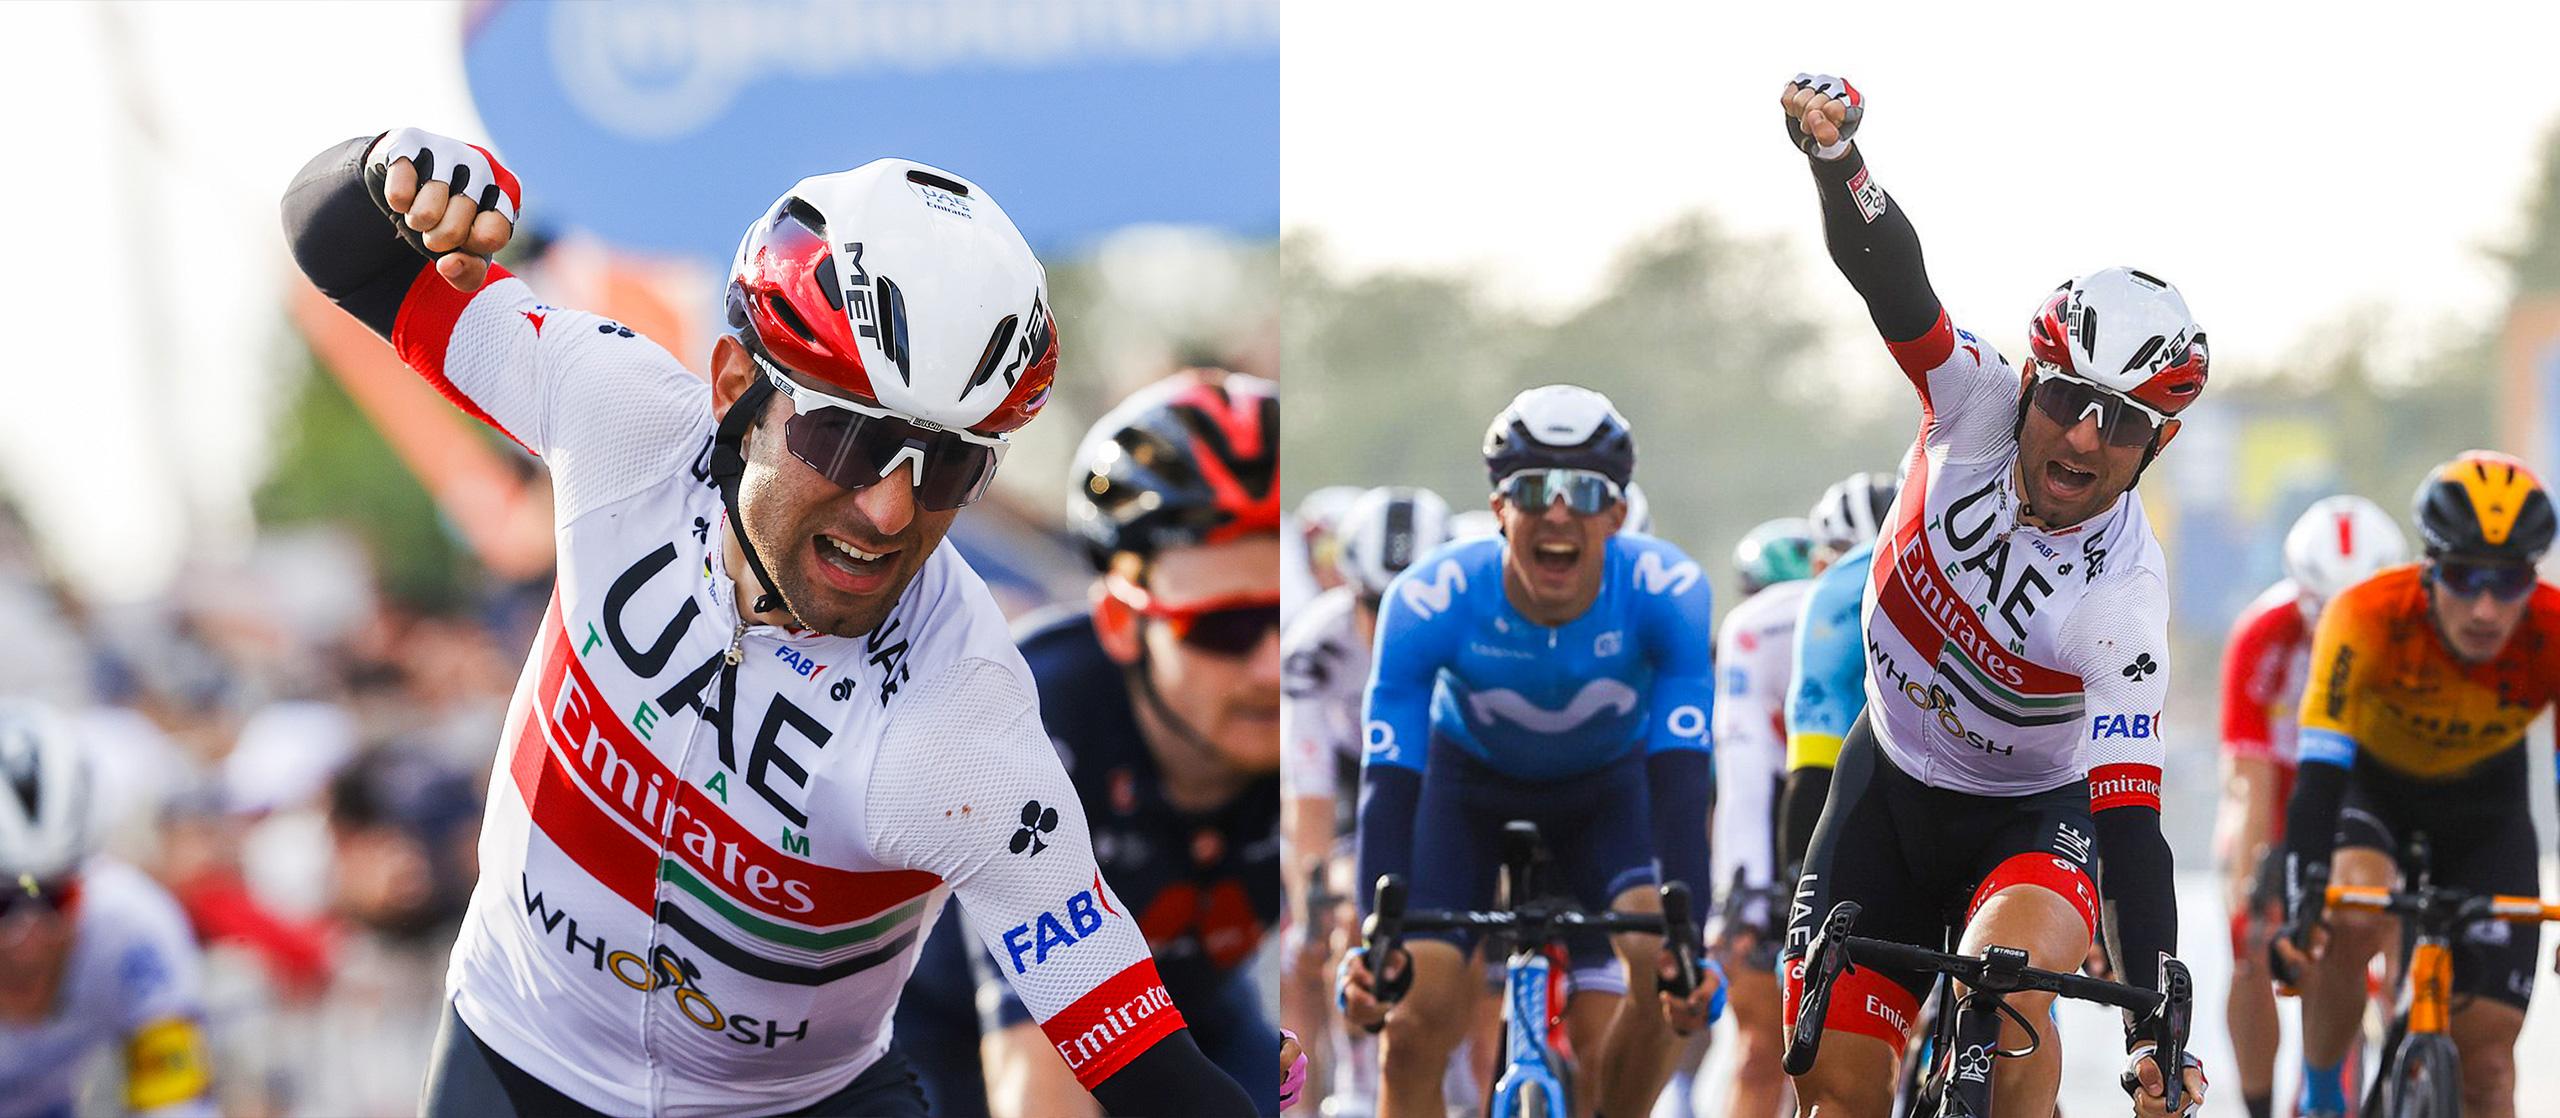 MET Helmets Giro d'Italia UAE Team Emirates